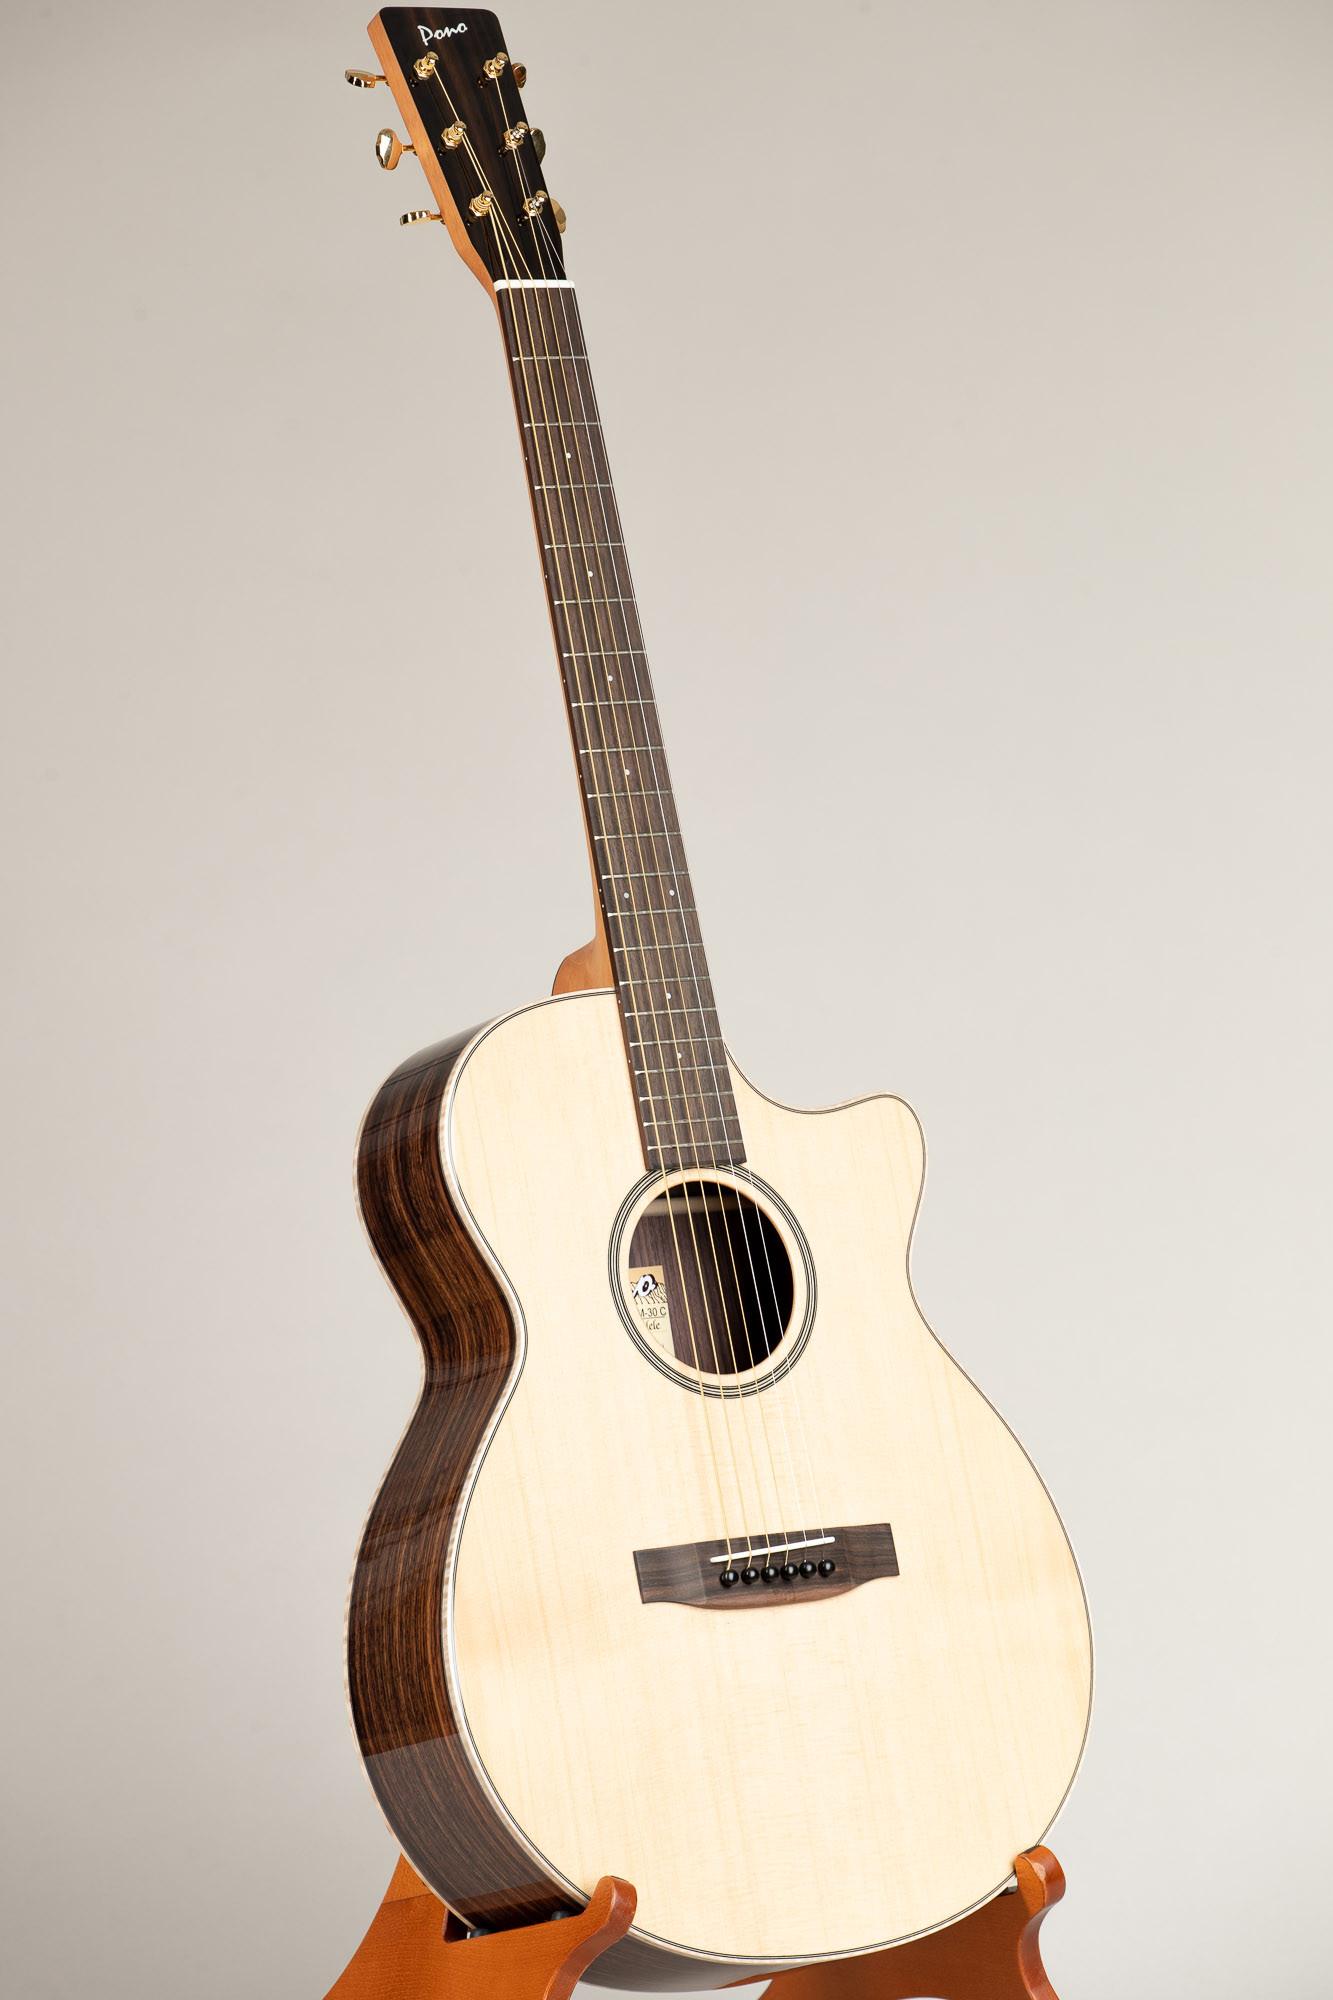 Pono Spruce Top Rosewood OM Cutaway Steel String Guitar (OM-30C(S) 4858)